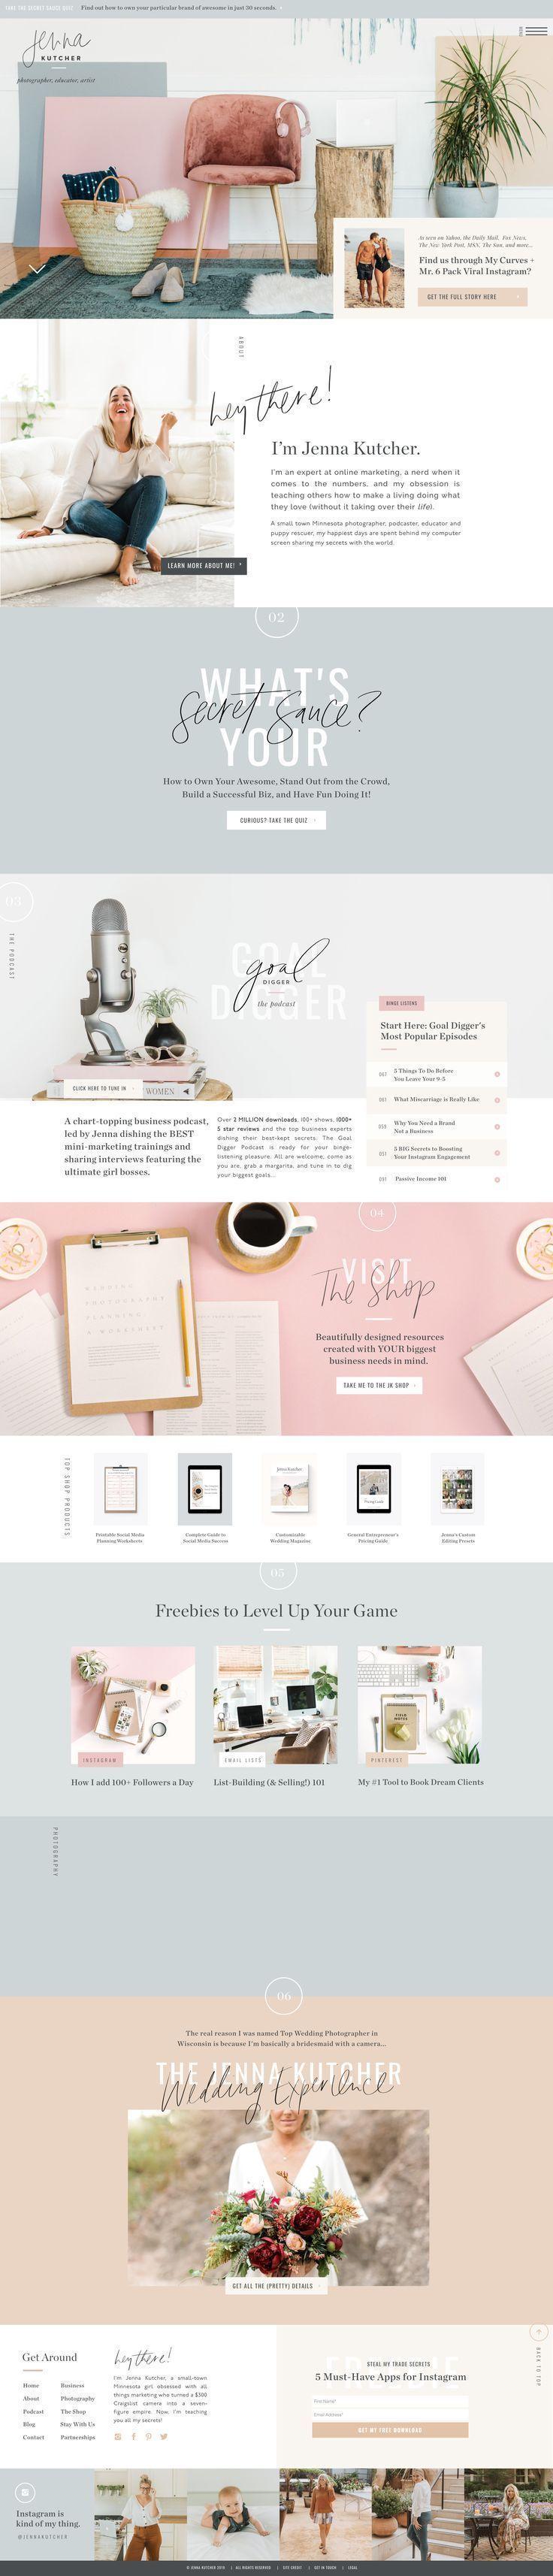 Marketing Entrepreneur Photographer In 2020 Website Layout Inspiration Web Layout Design Web Design Tips